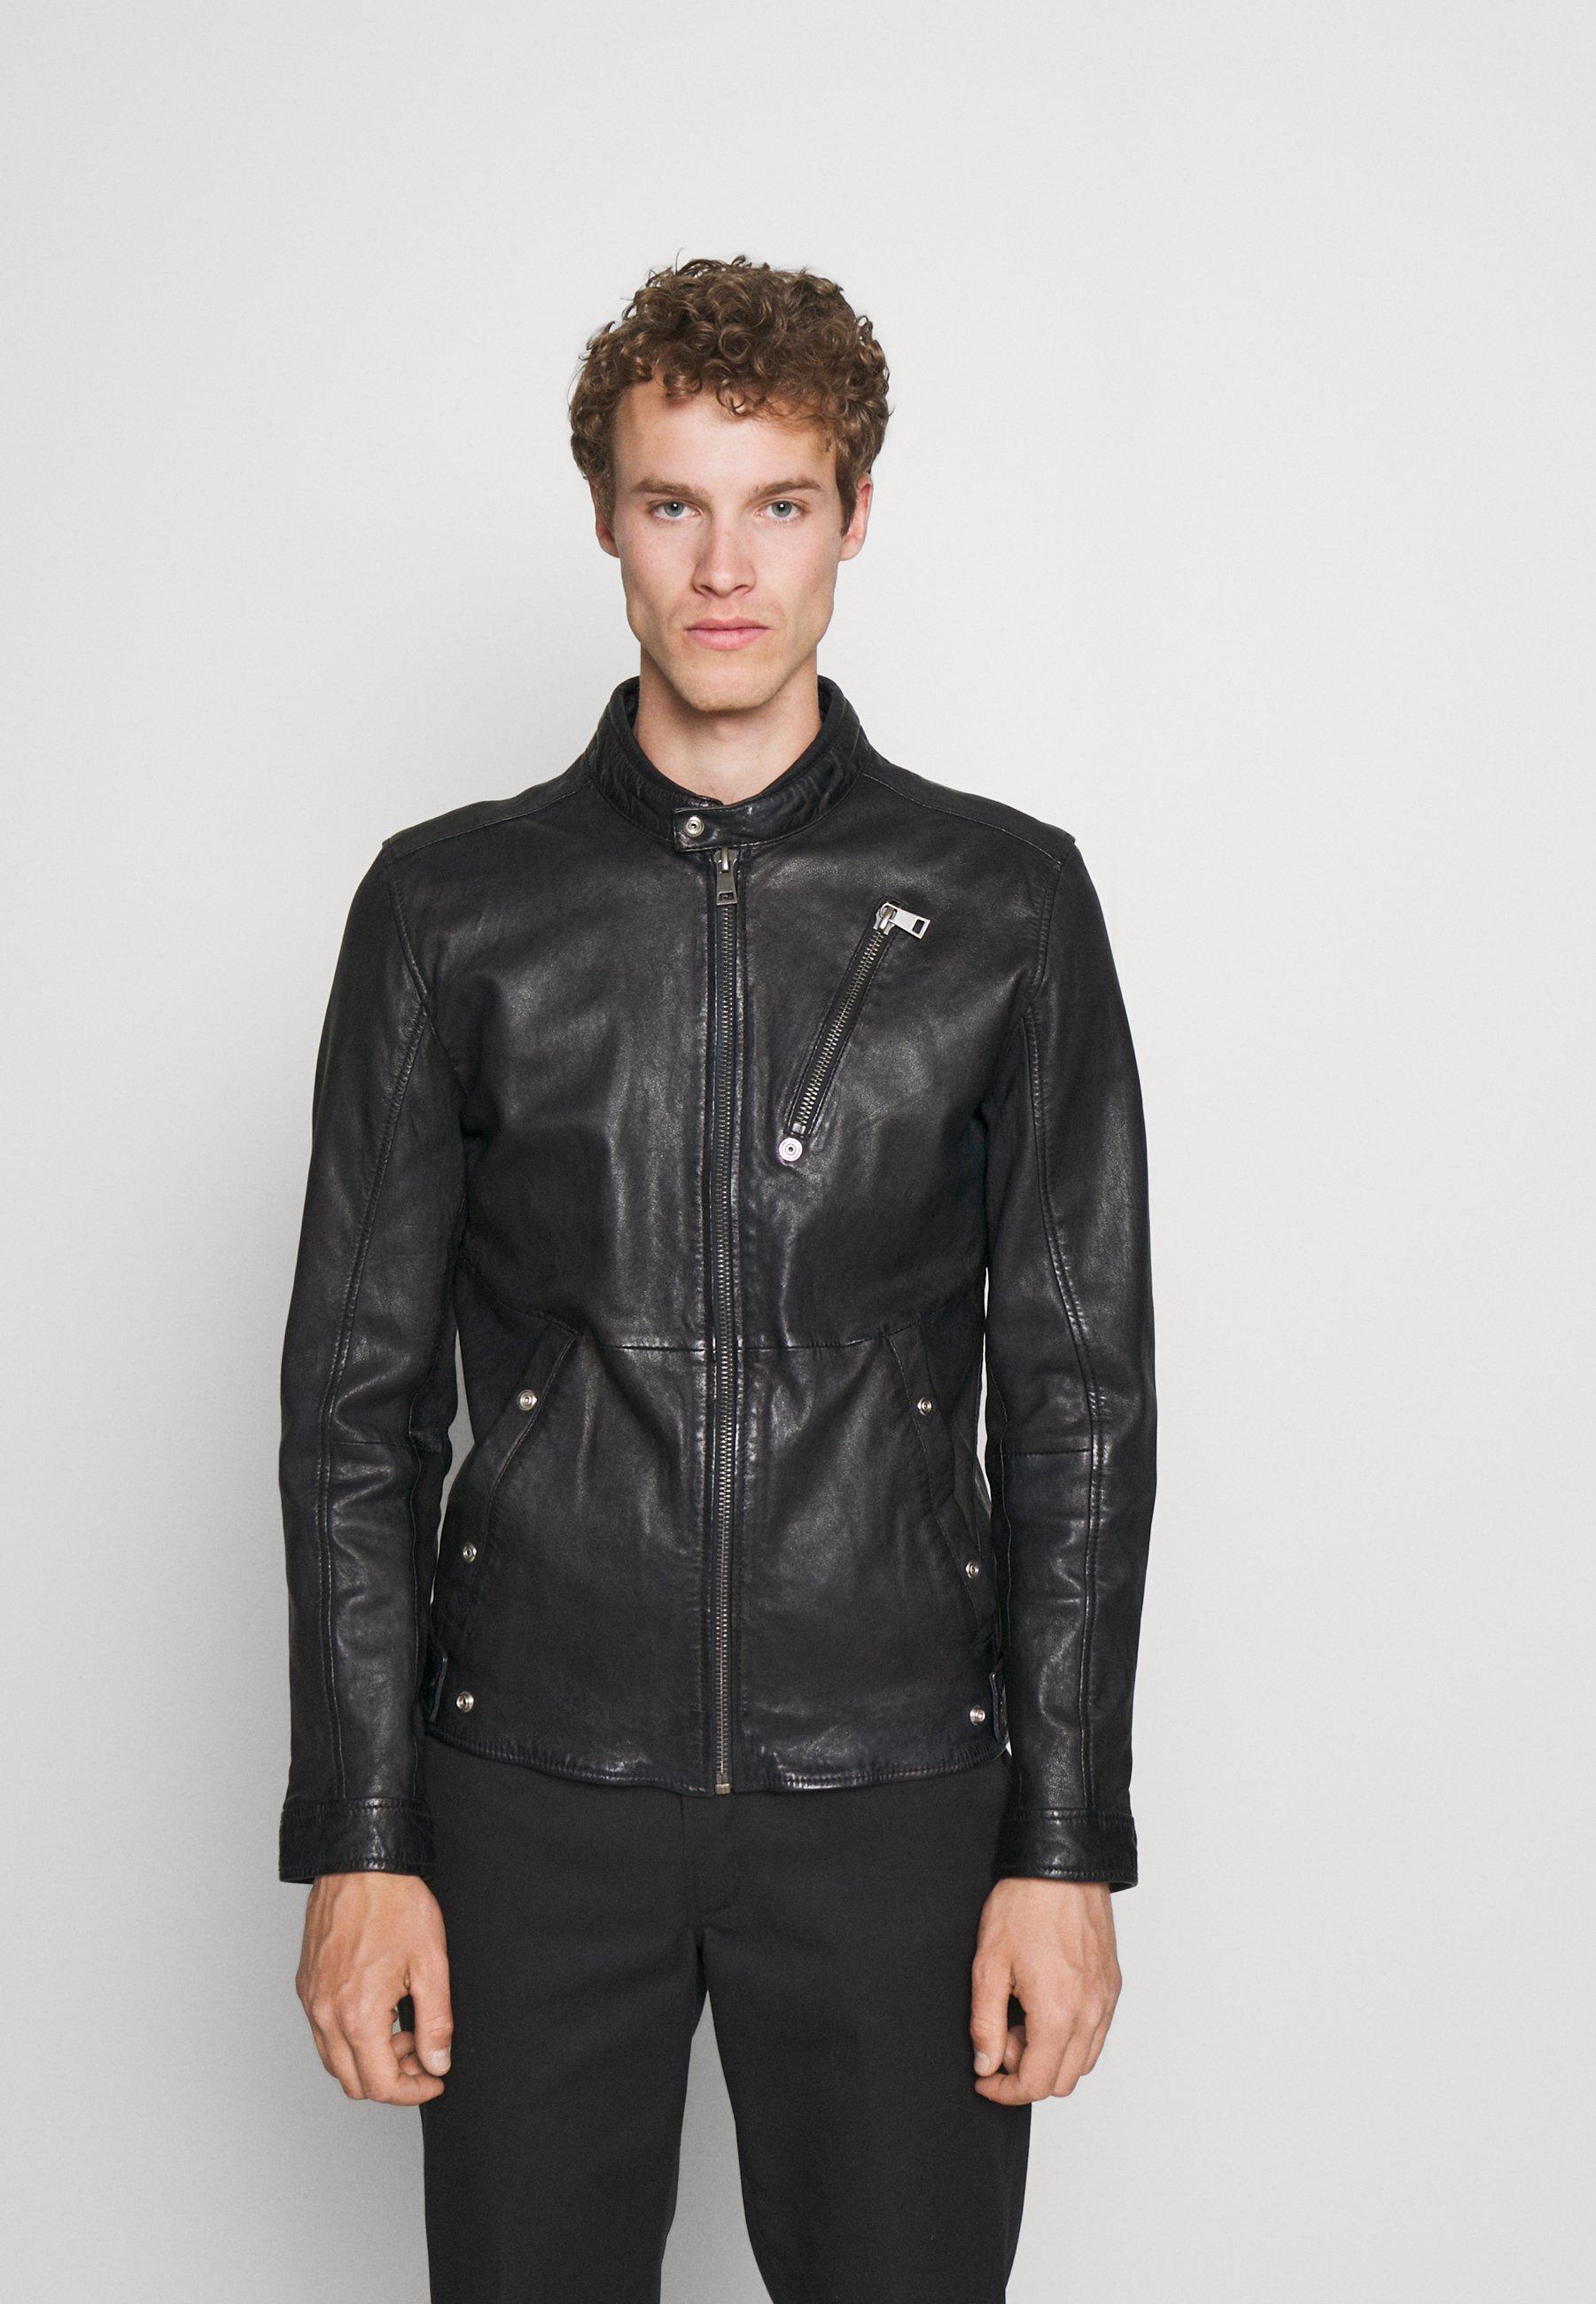 Men ASBEN - Leather jacket - black